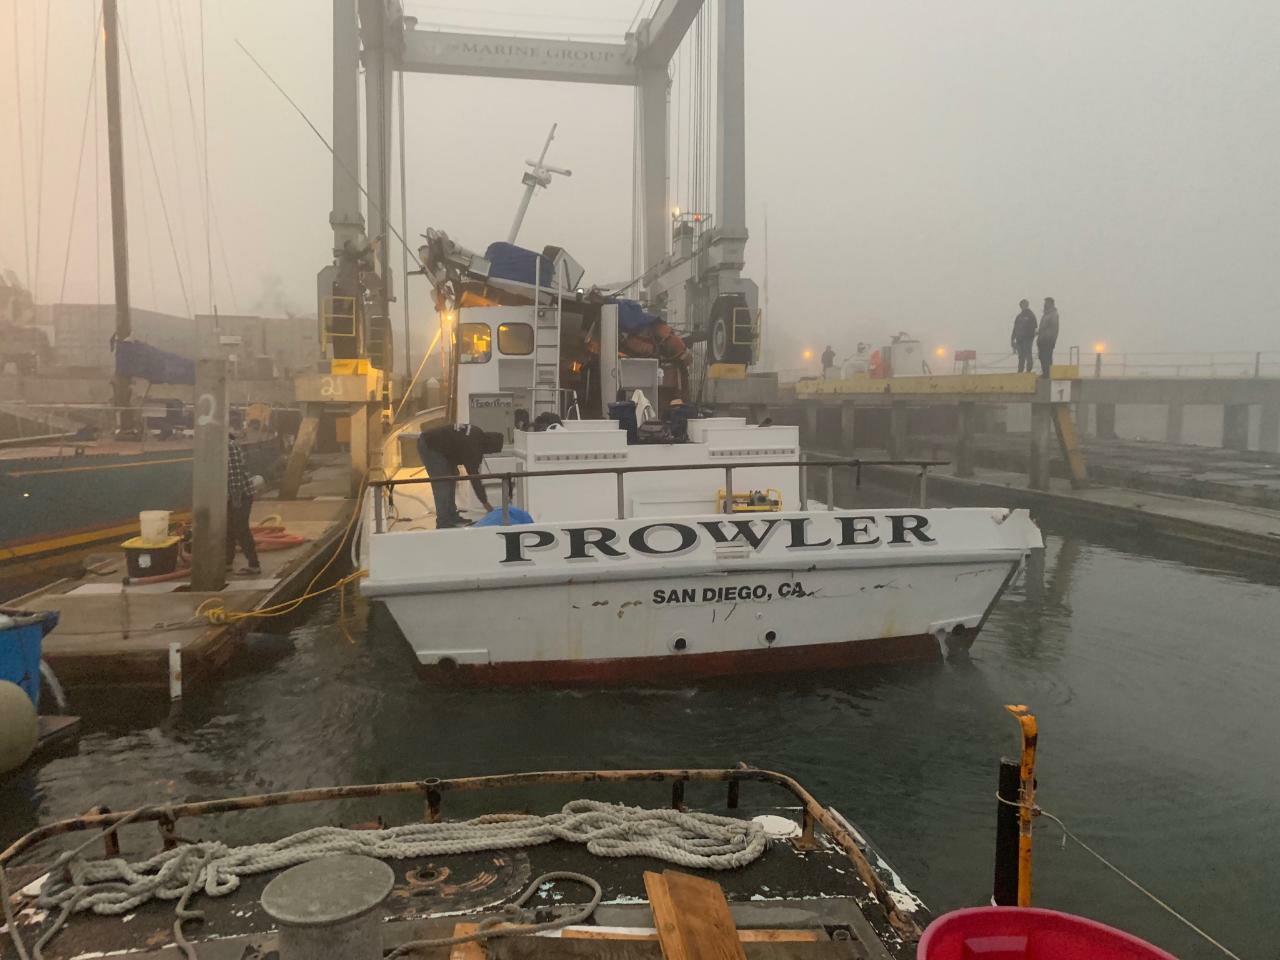 Prowler at dry dock.jpg